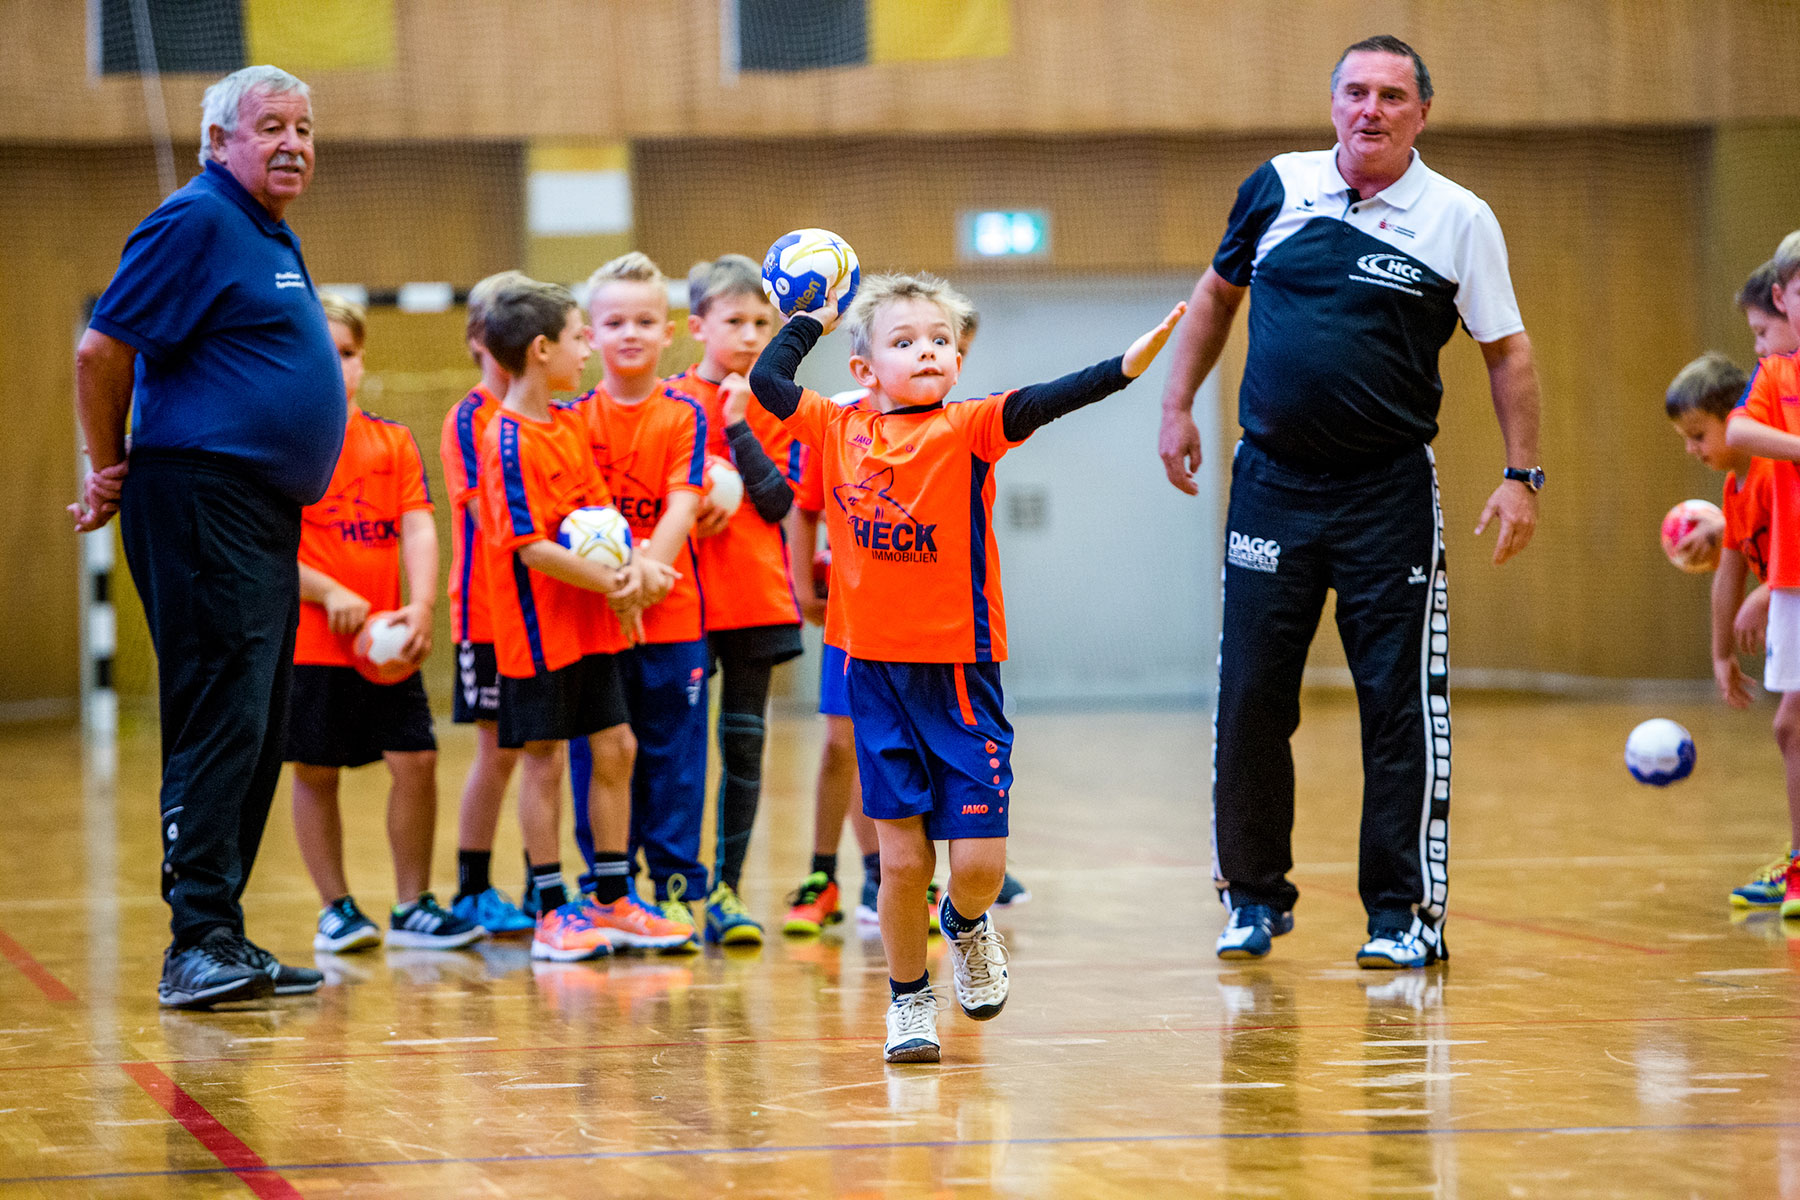 201809_Handballcamp_NDH (25)